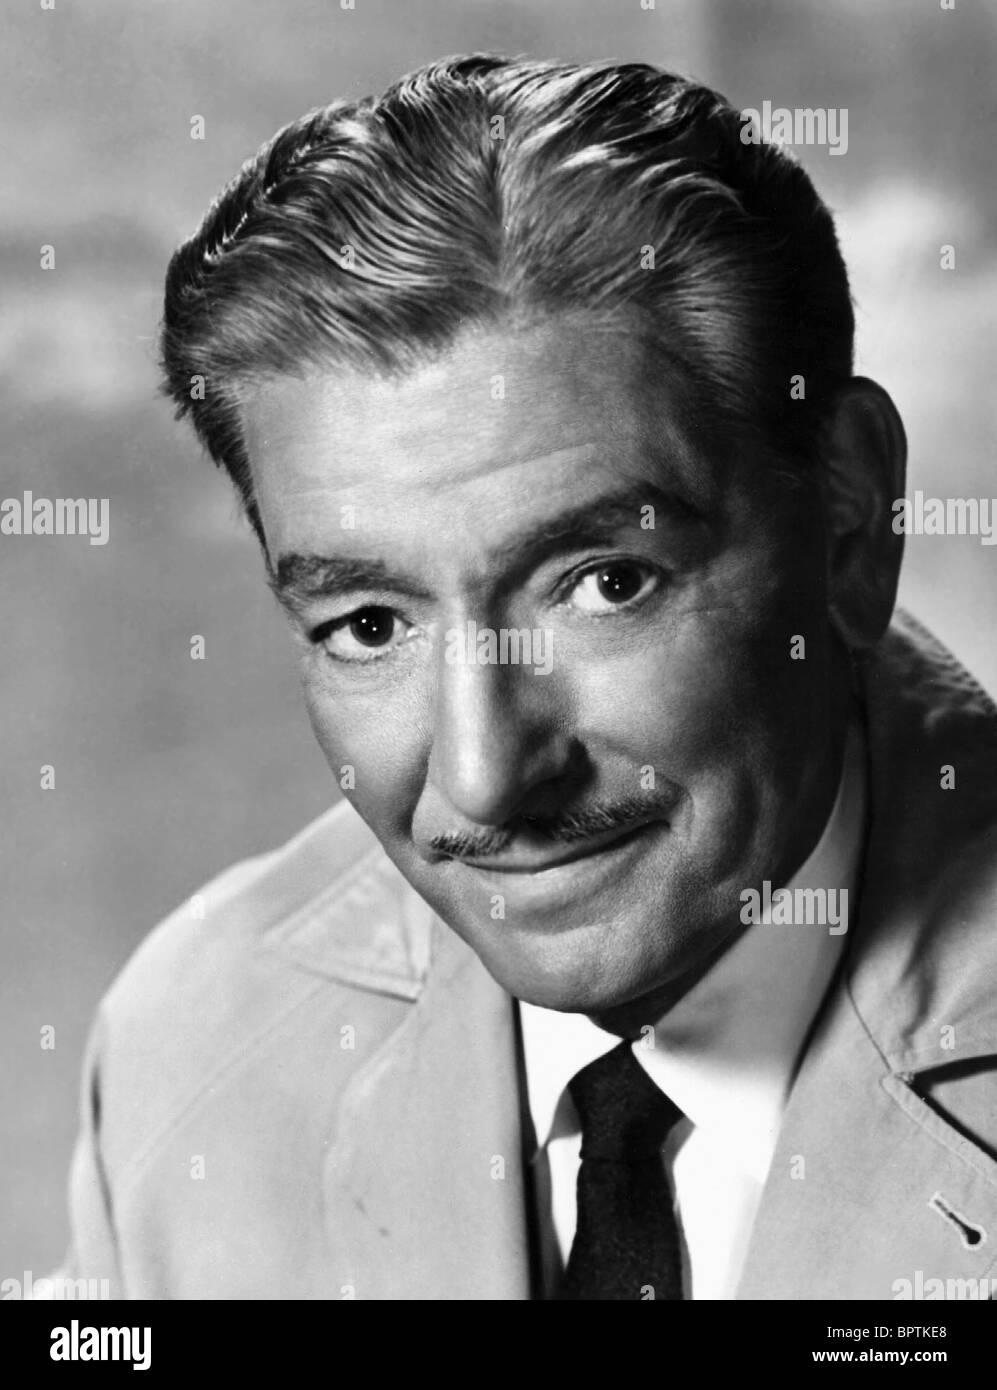 RONALD COLMAN ACTOR (1949) - Stock Image